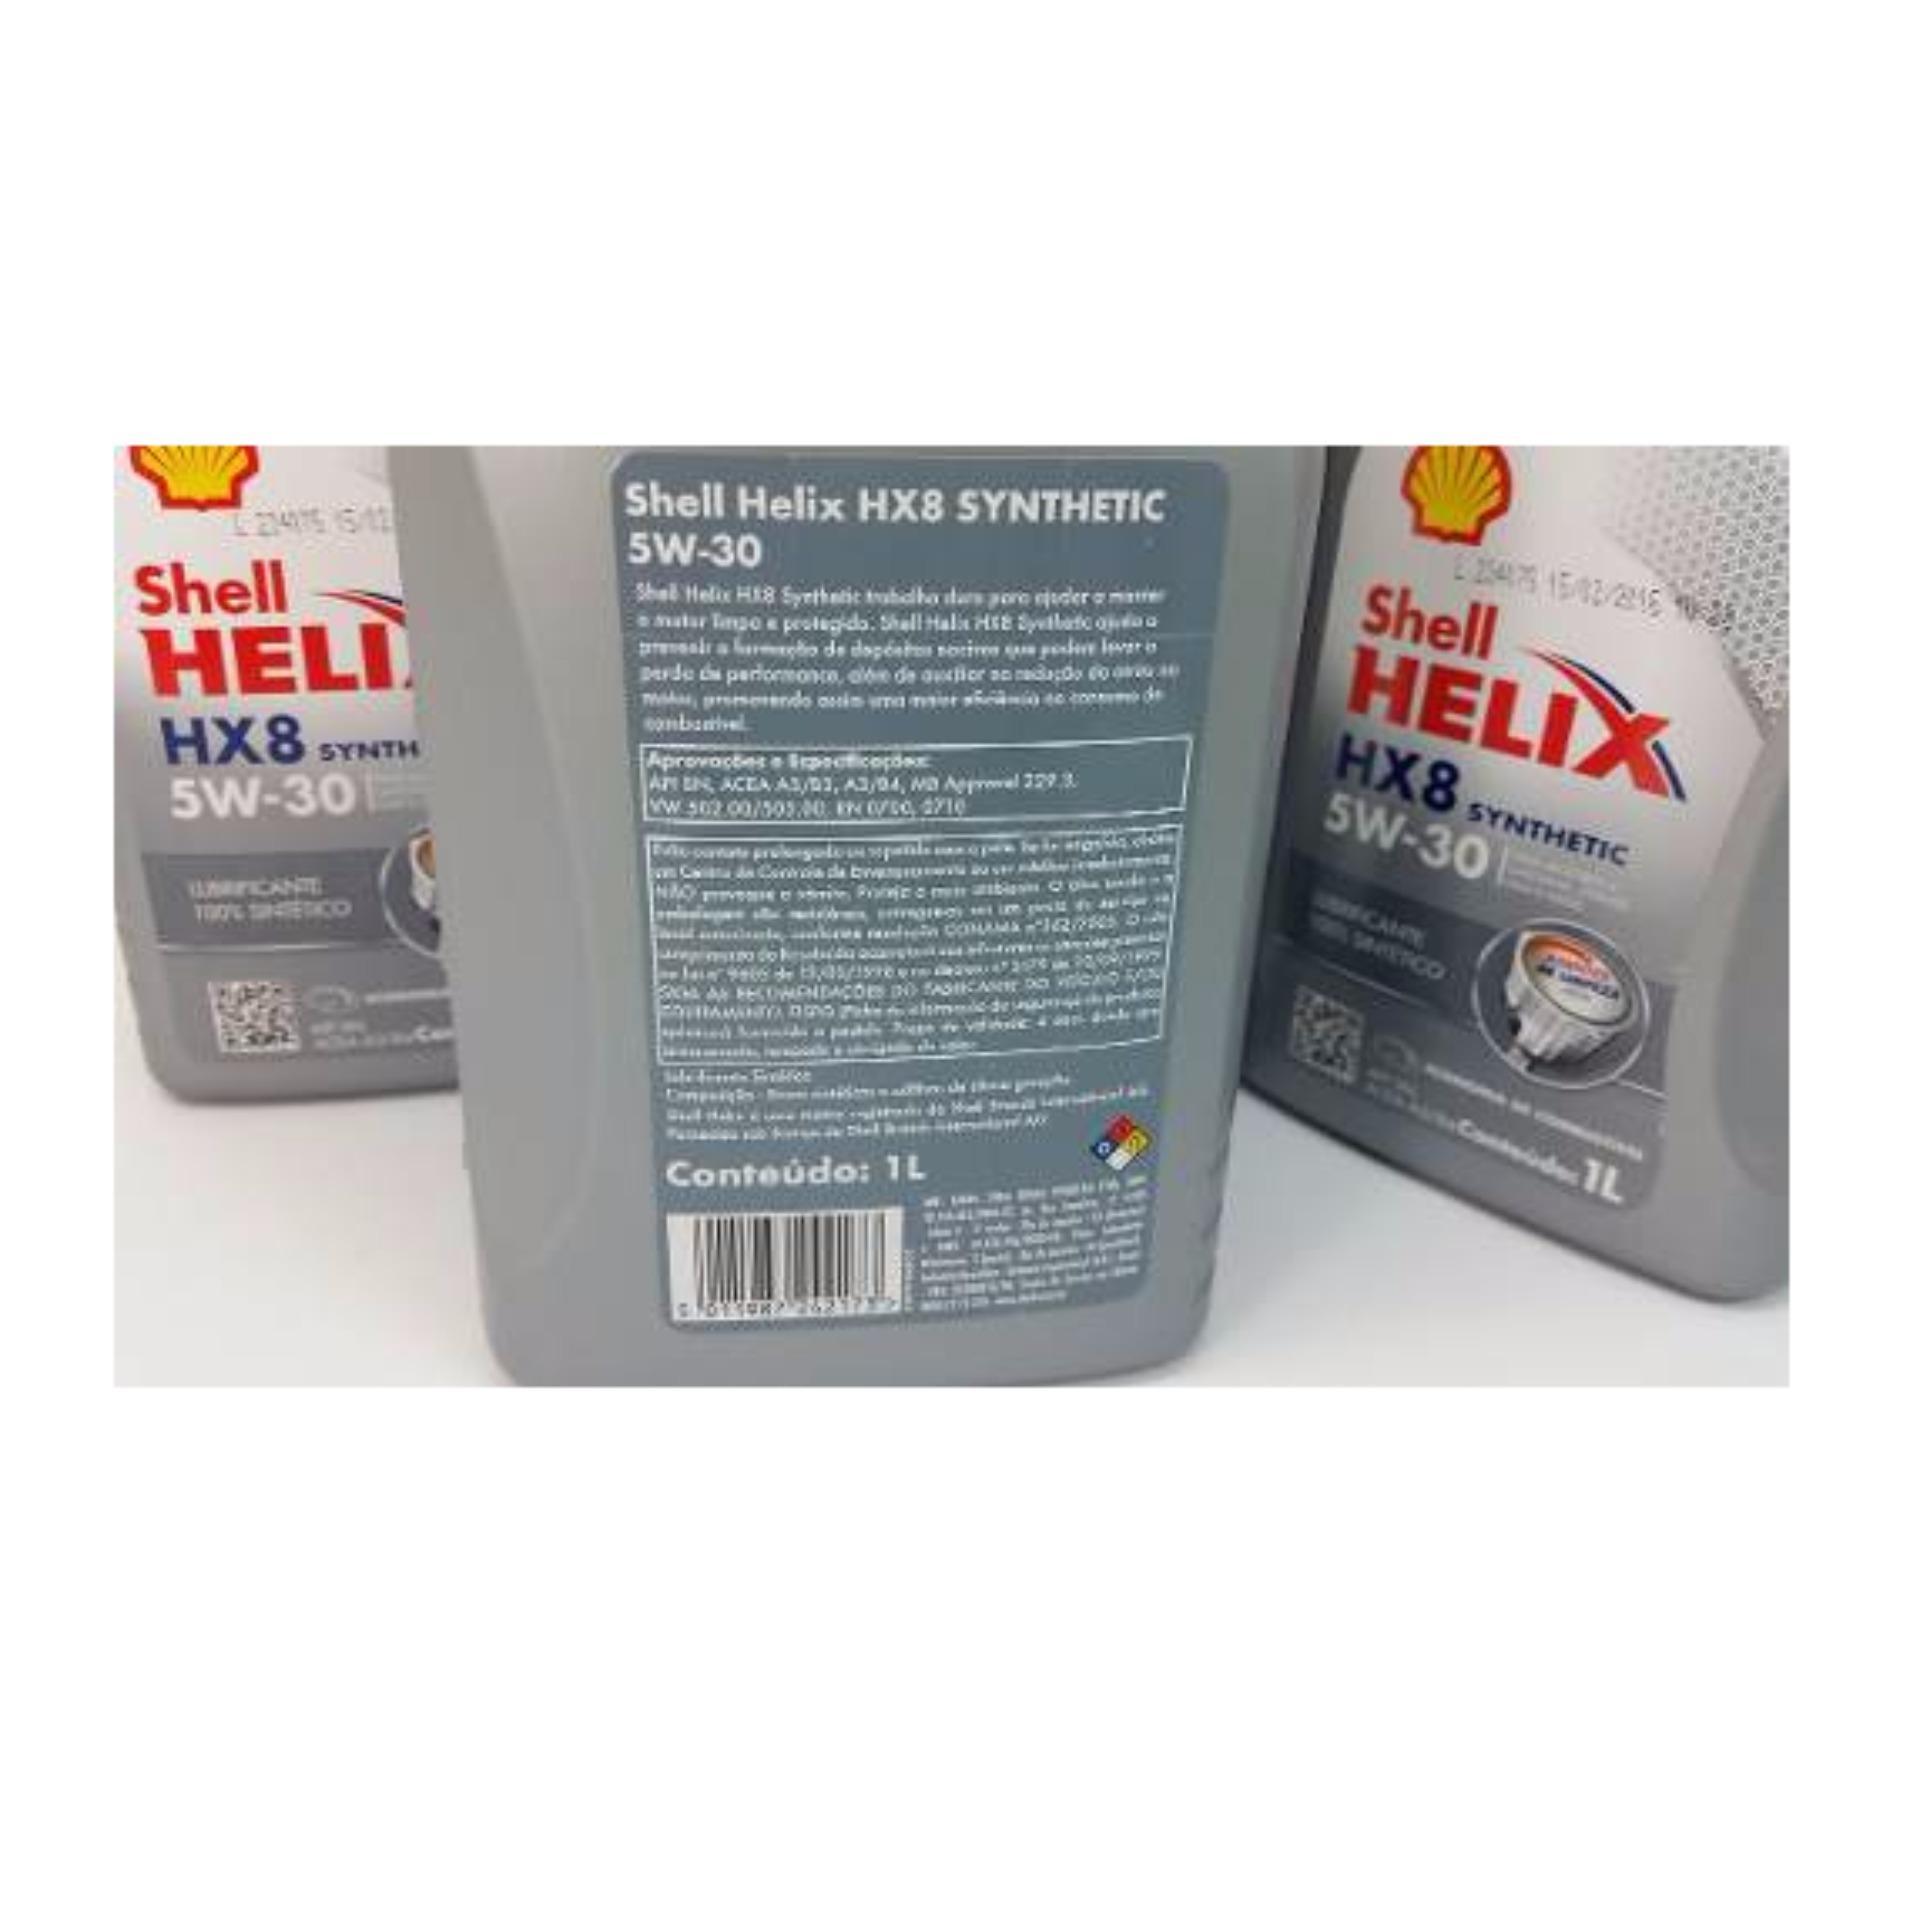 Online Murah Shell Helix Hx8 5w 30 Fully Synthetic 1 Liter Ultra 40 Api Sn Cf Oil Pelumas Oli Mesin Mobil 4 Original Resmi Segel